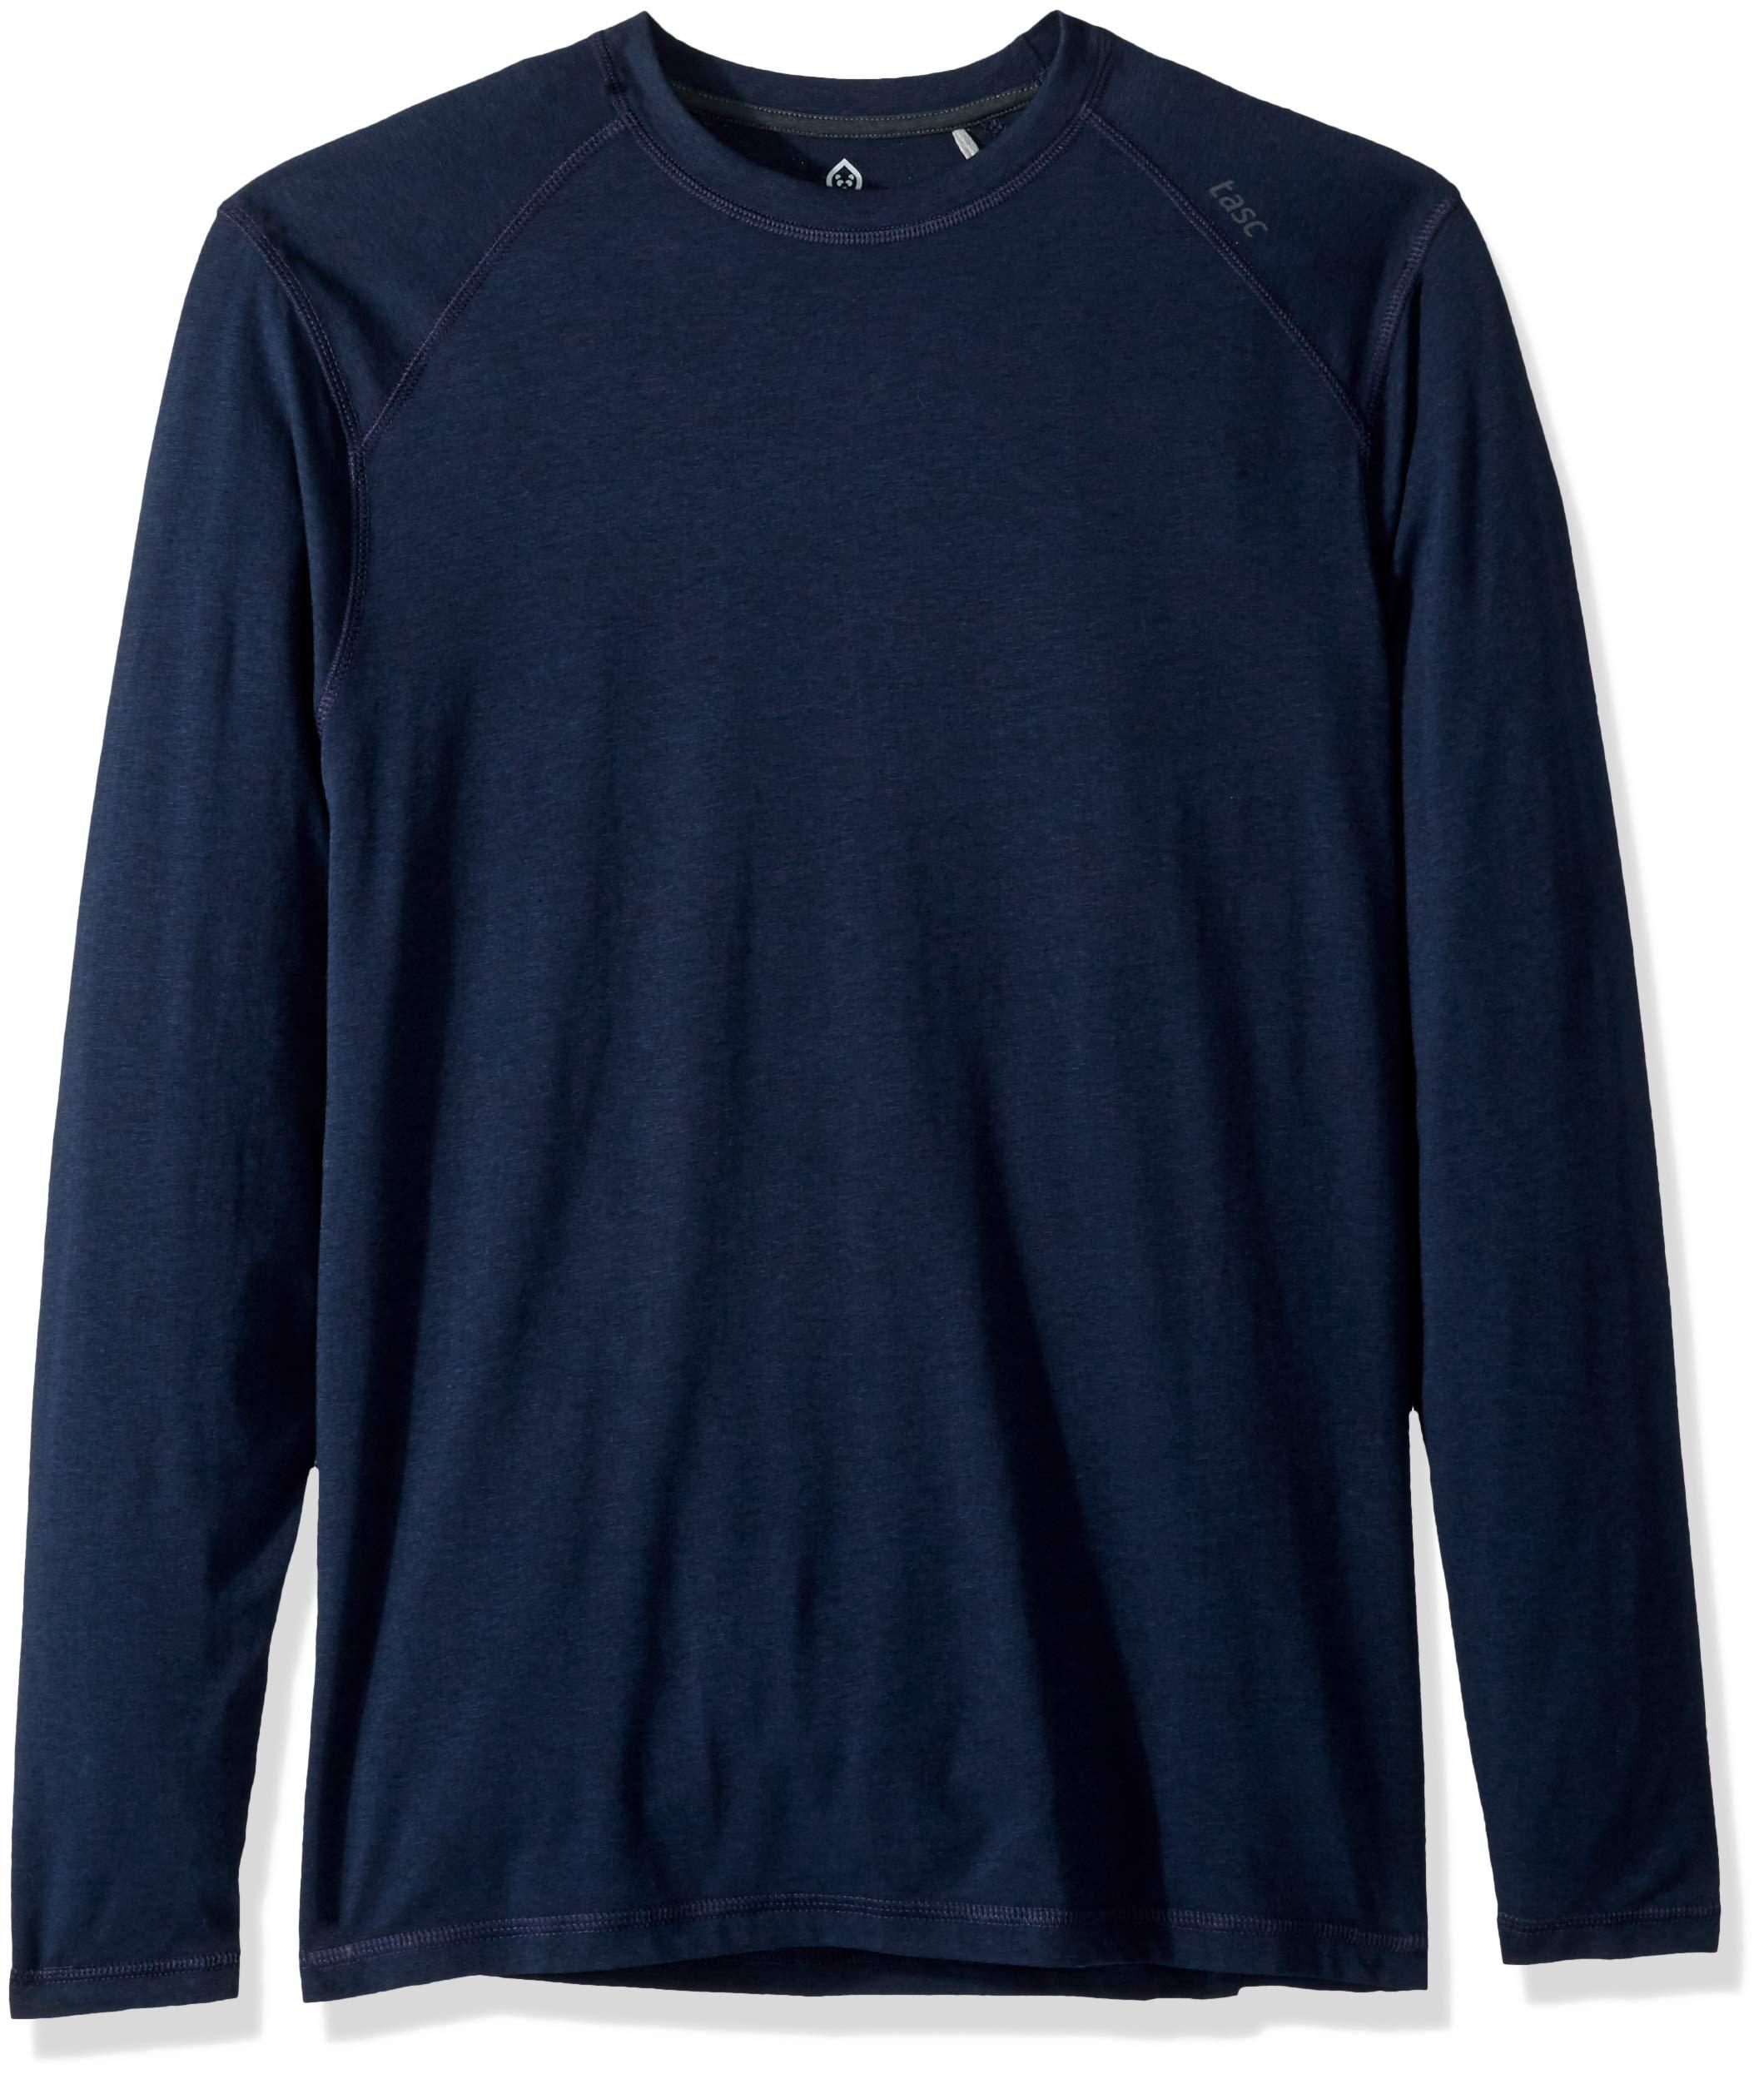 tasc Performance Carrollton Long Sleeve T-Shirt, classic Navy, Small by tasc Performance